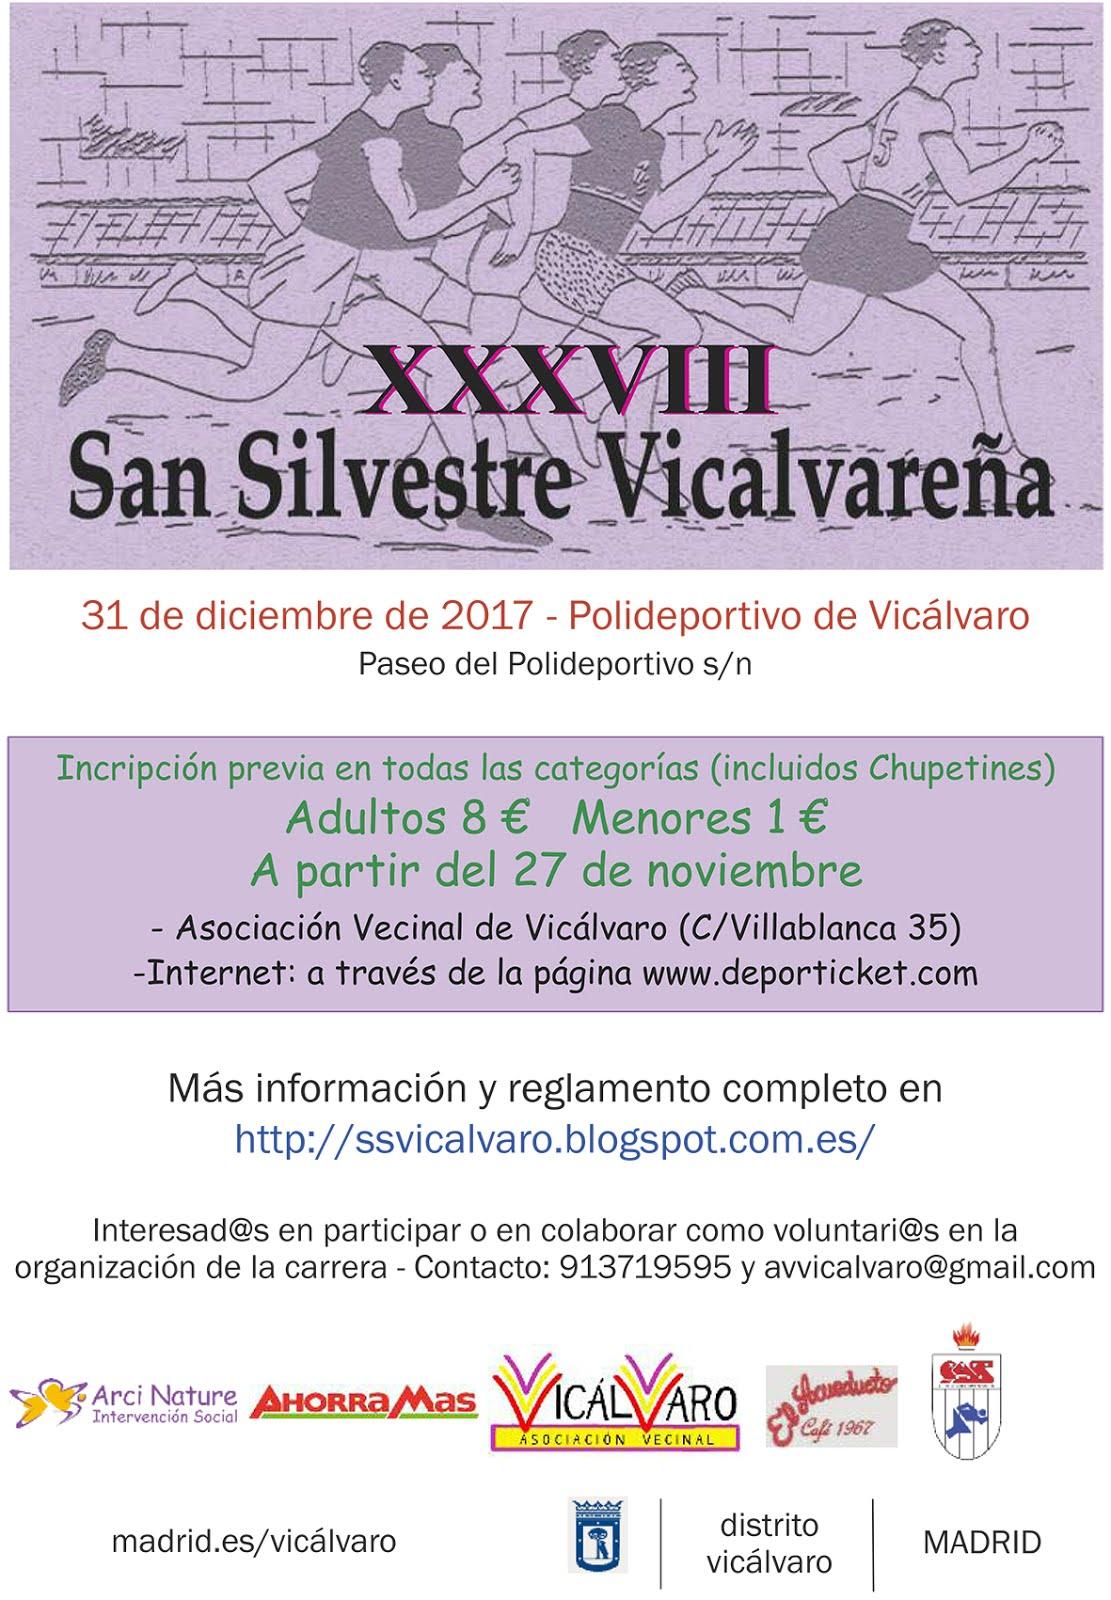 San Silvestre Vicálvaro